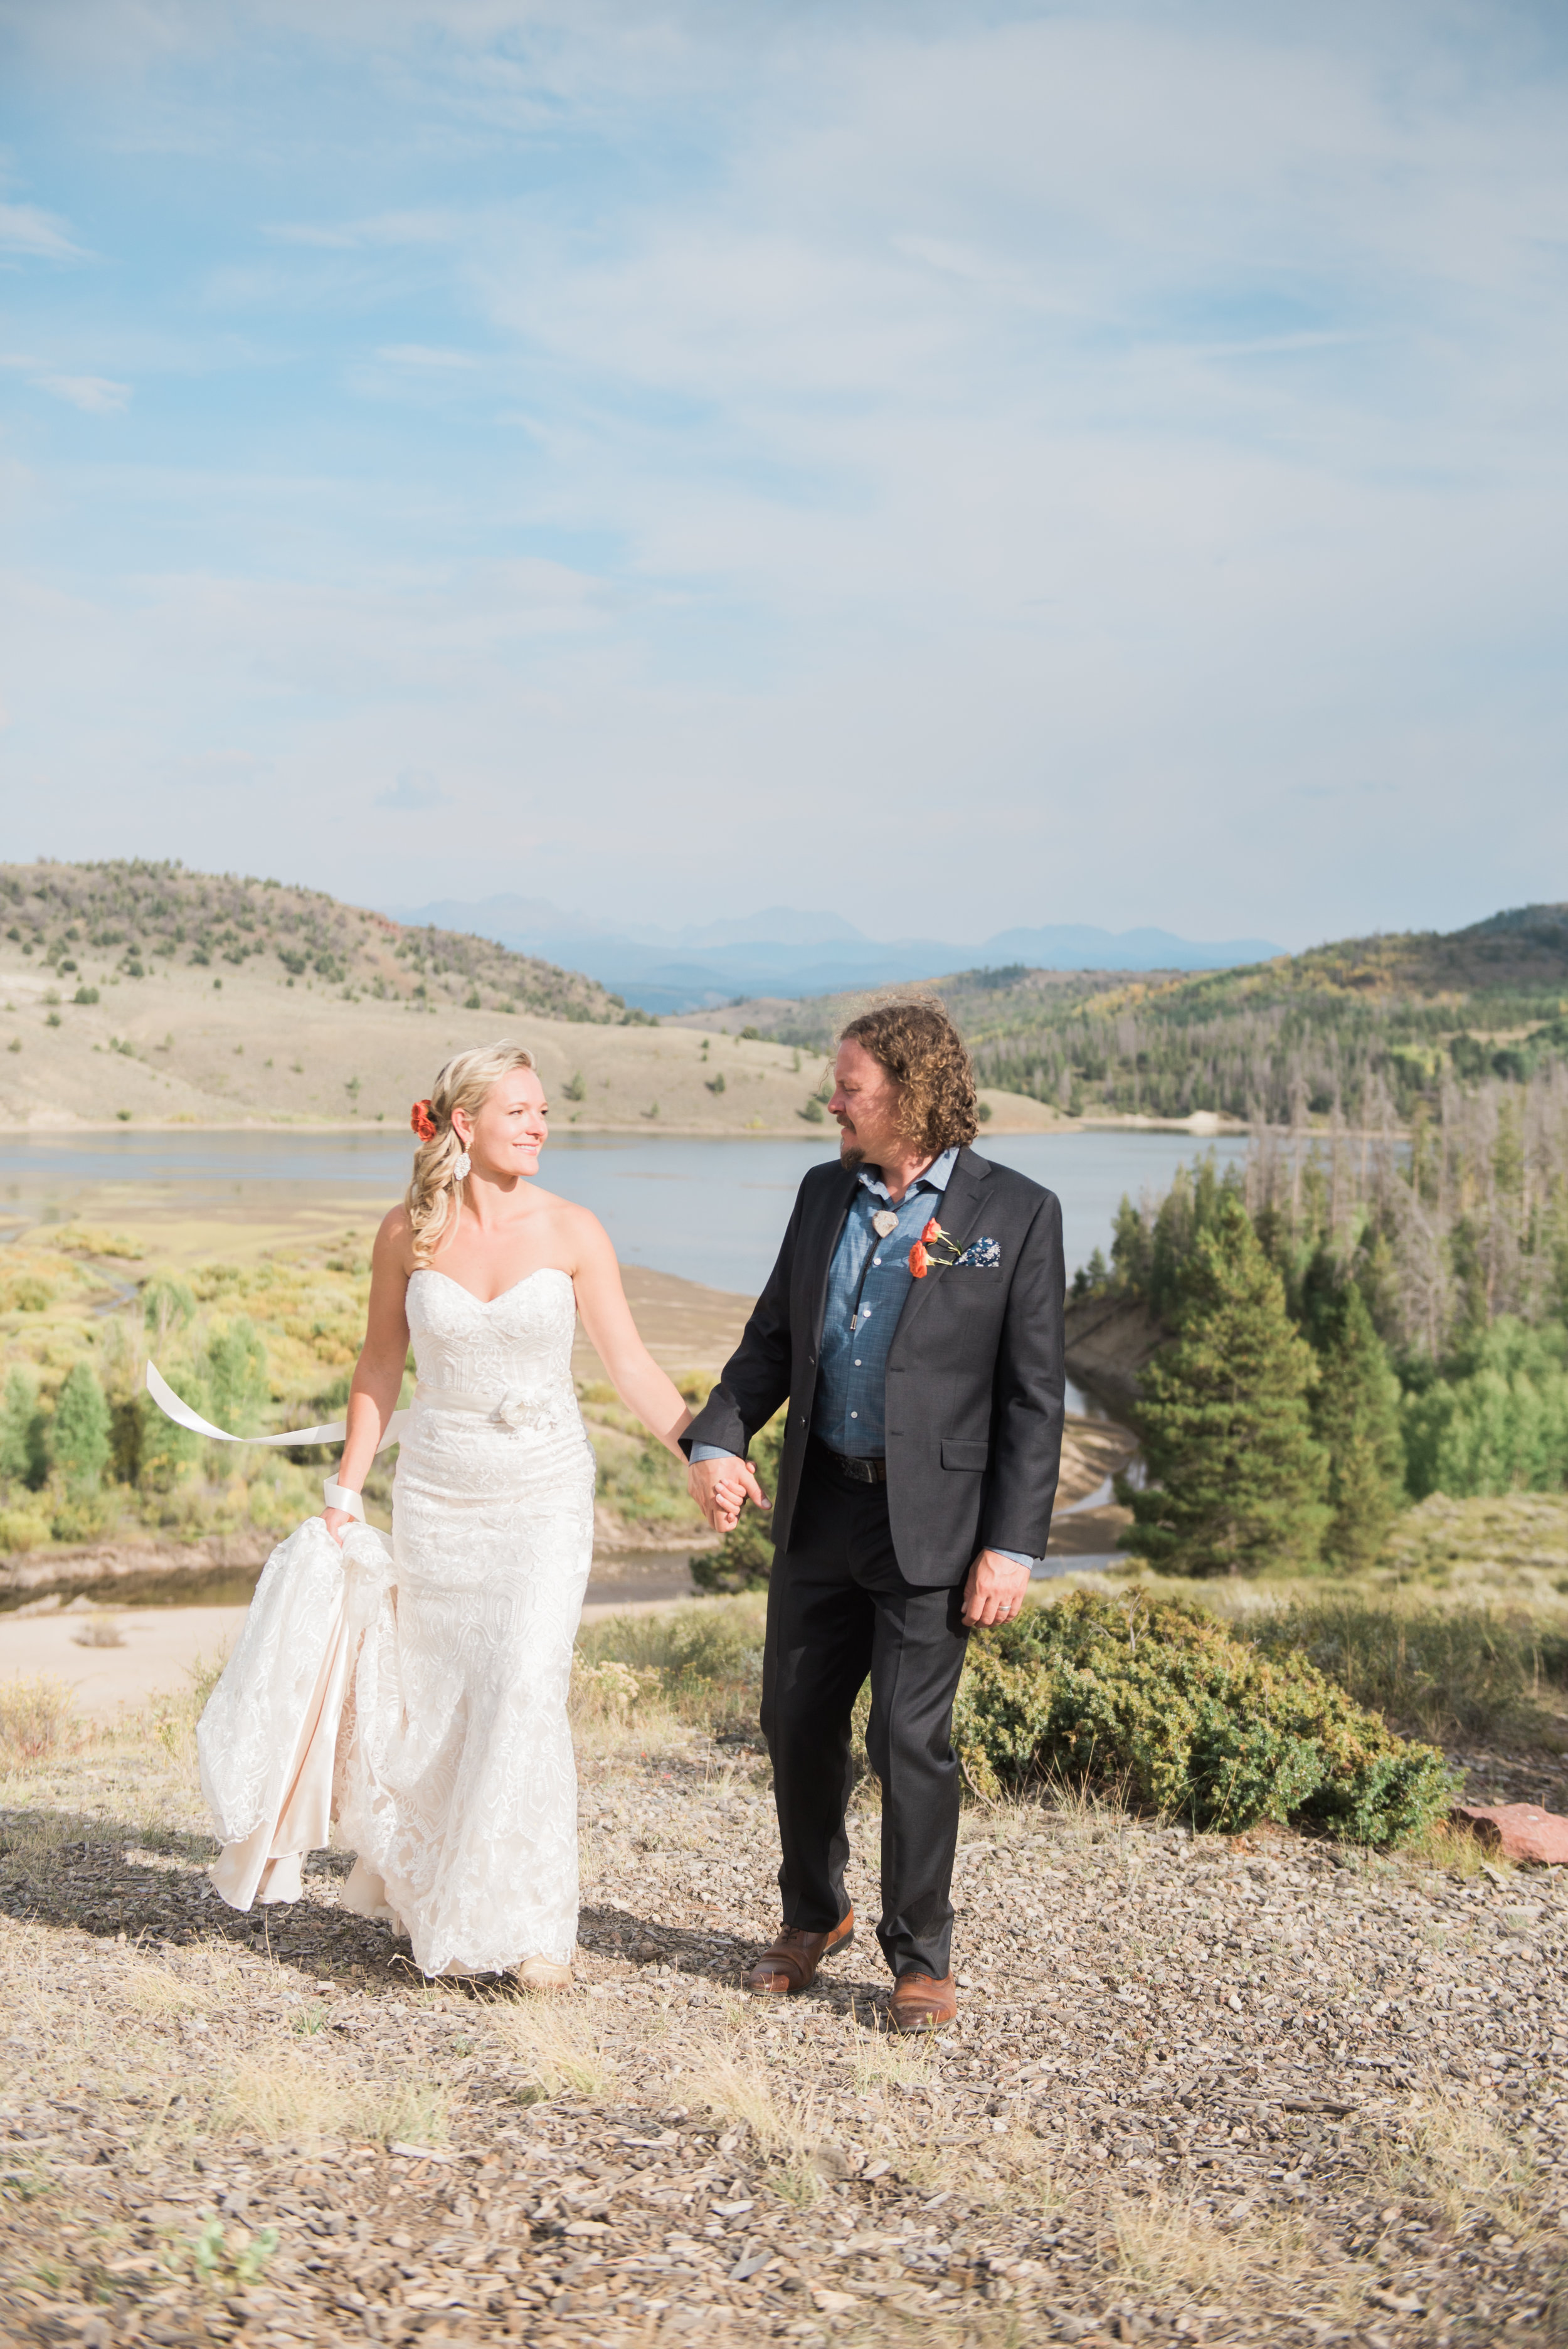 clazyuranch-denver-wedding-photographer-ashleighmillerweddings-1074.jpg